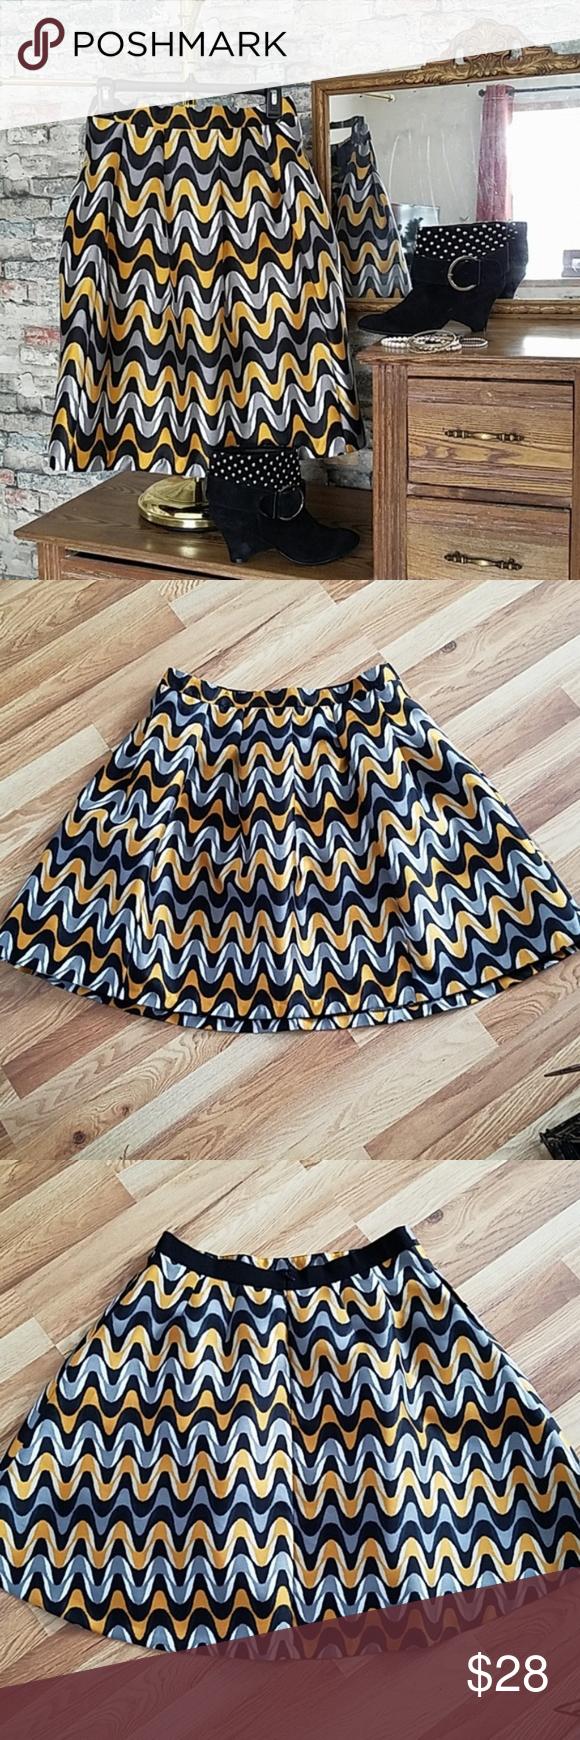 LANE BRYANT Black Golden Yellow Chevron Skirt 16 | Clothes